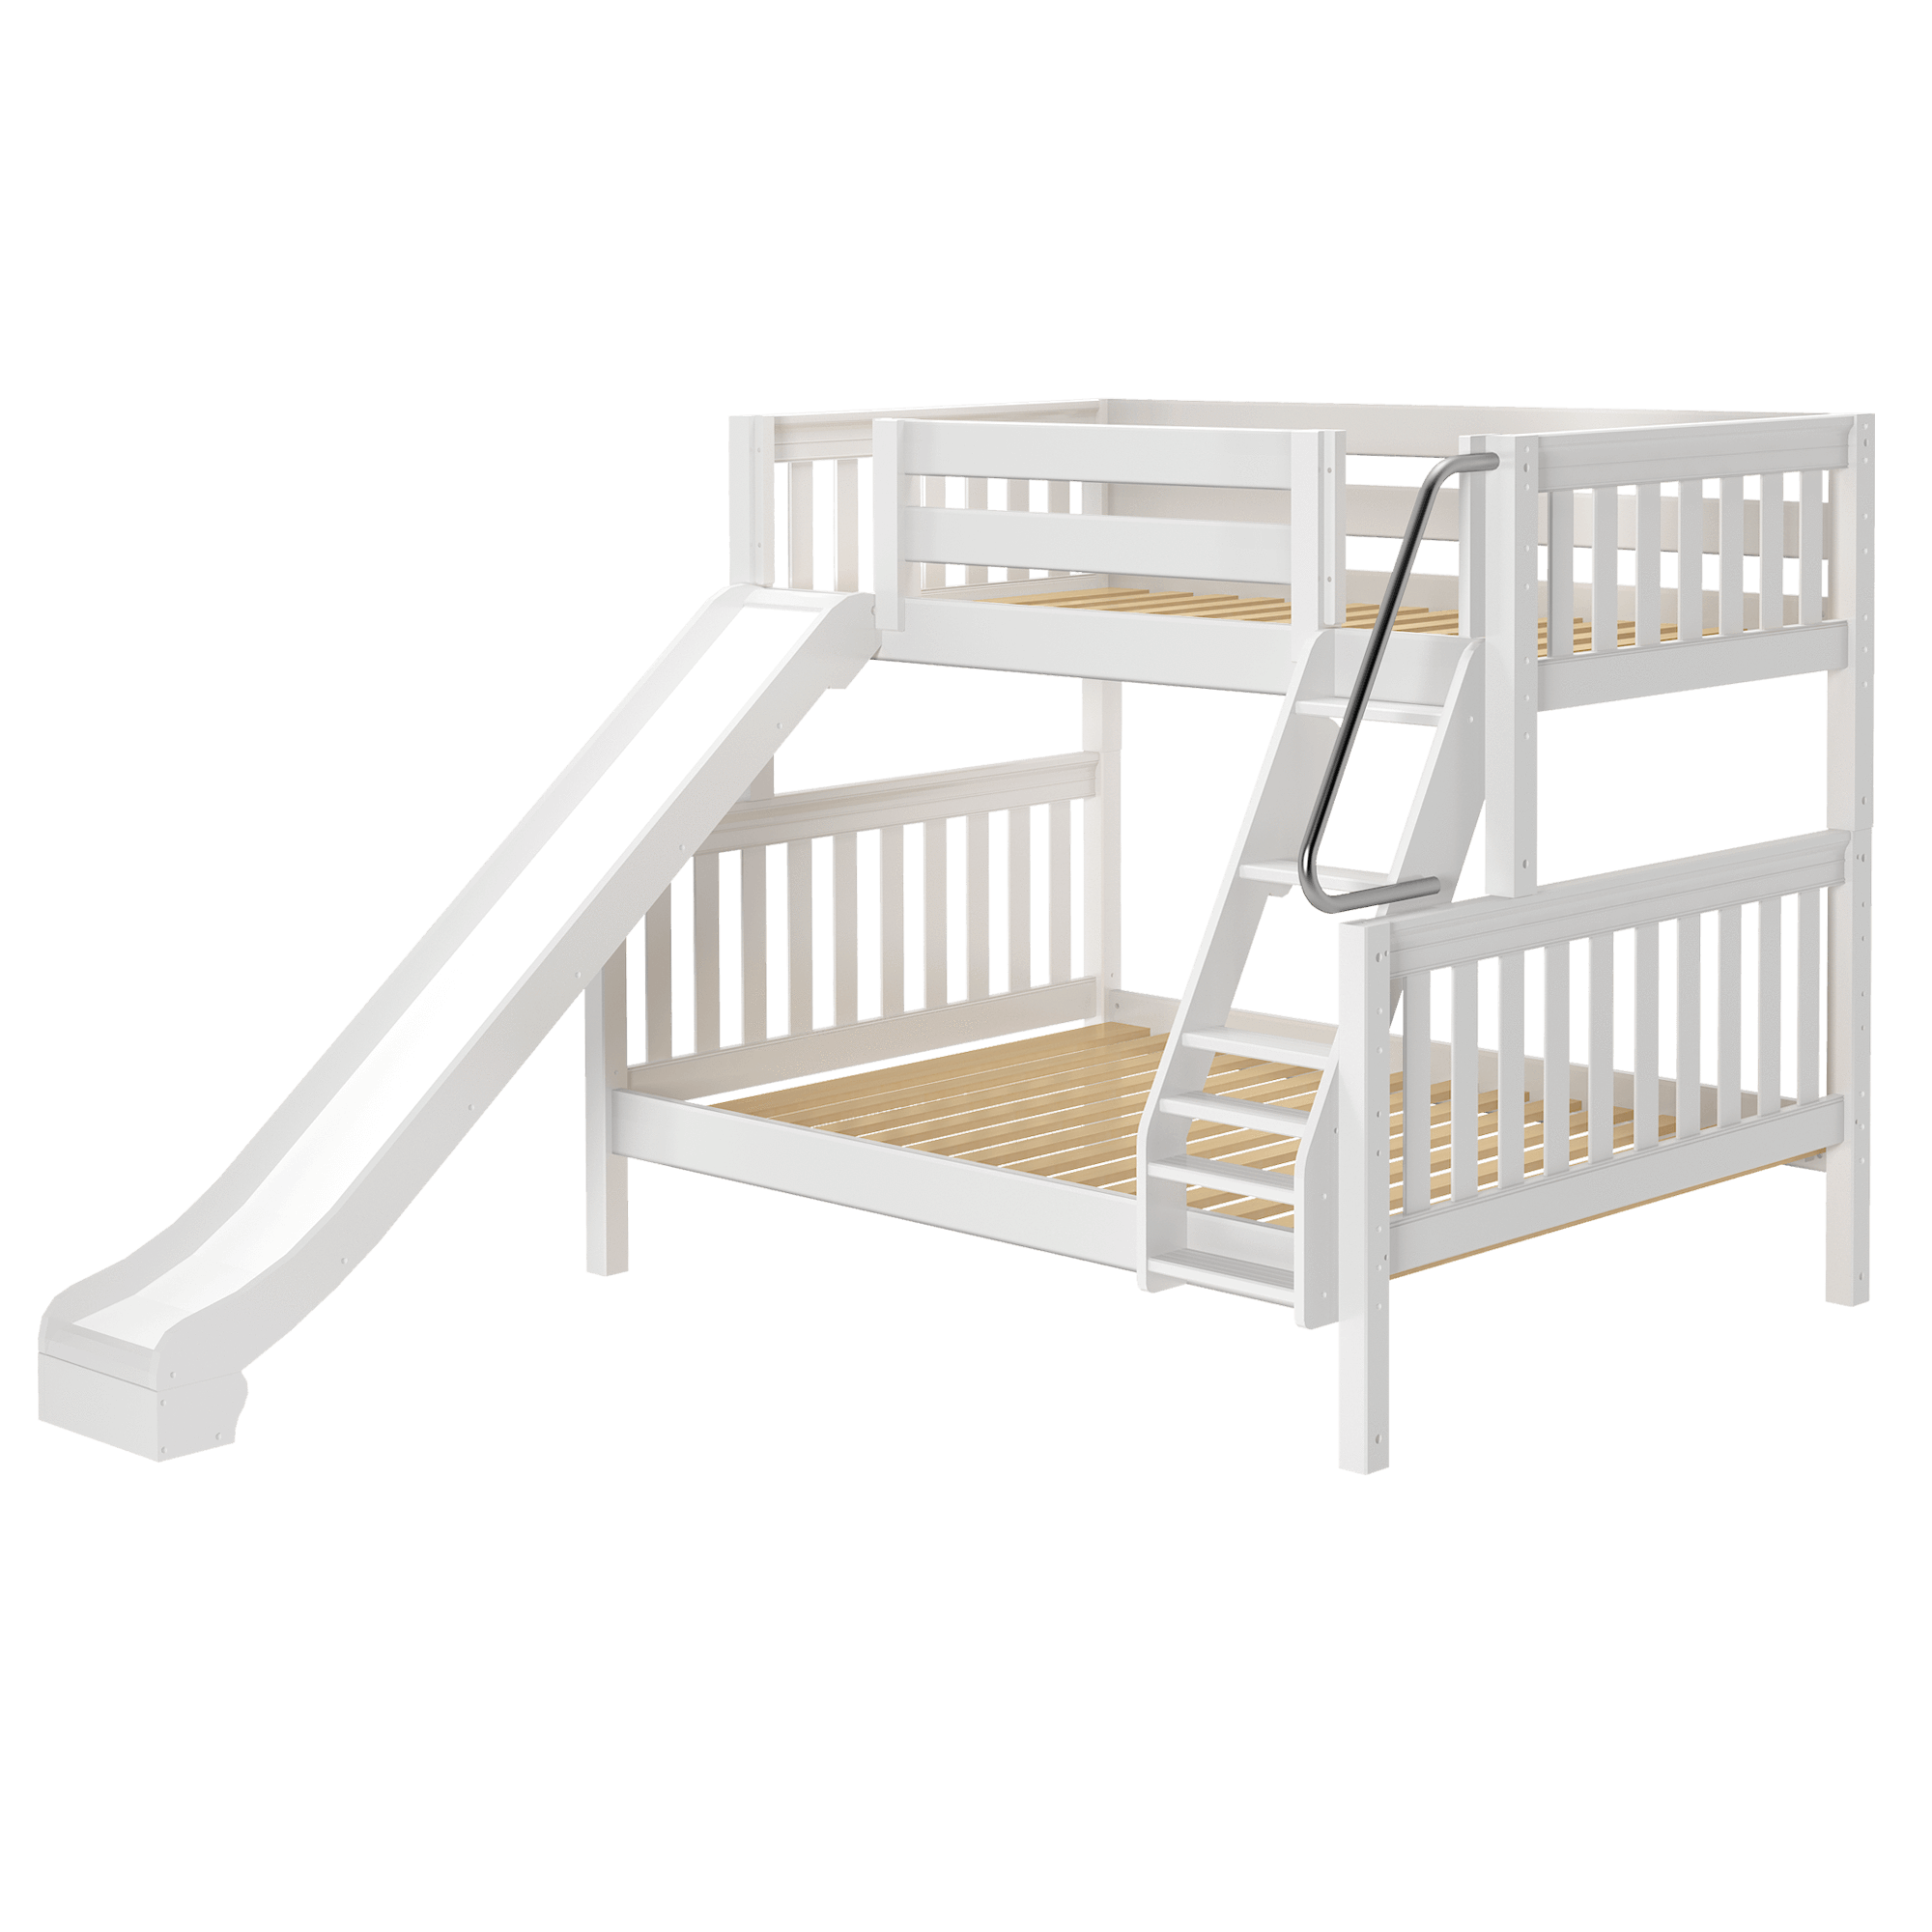 Twin Over Full Medium Bunk Bed Slide Bunk Bed With Slide Bed With Slide Bunk Beds